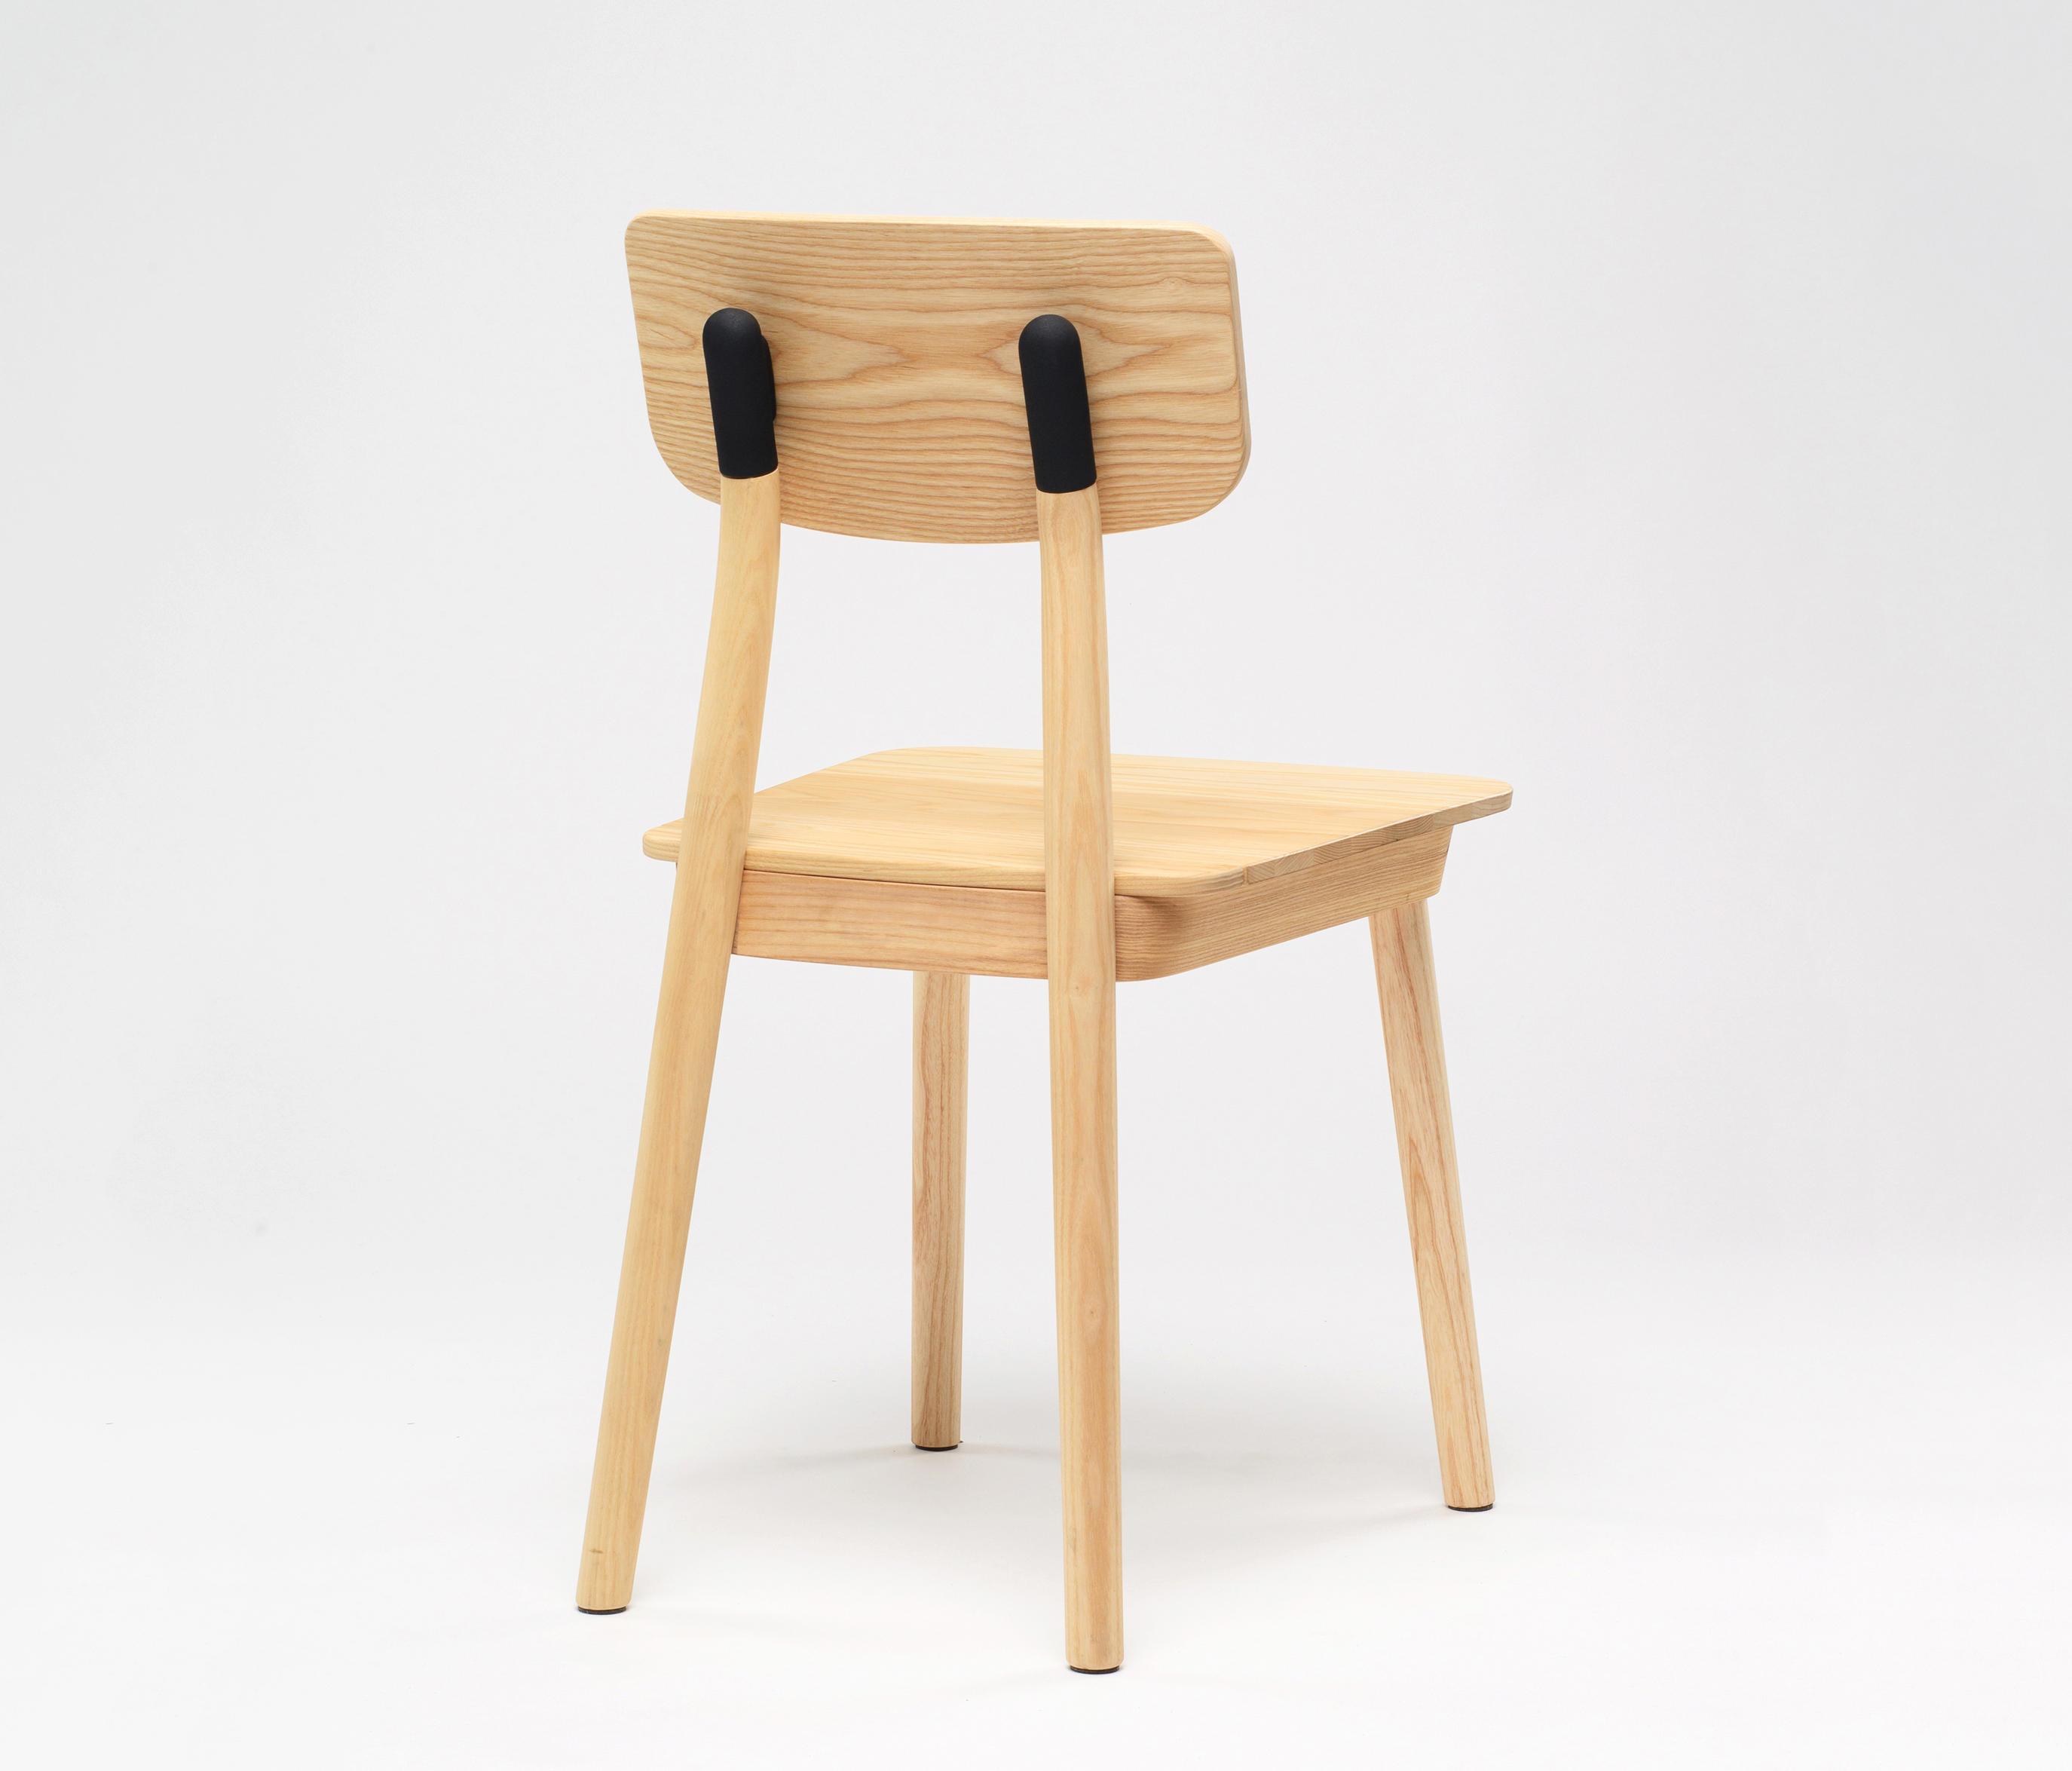 Clip chair restaurant chairs from de vorm architonic for Dutch design chair karton